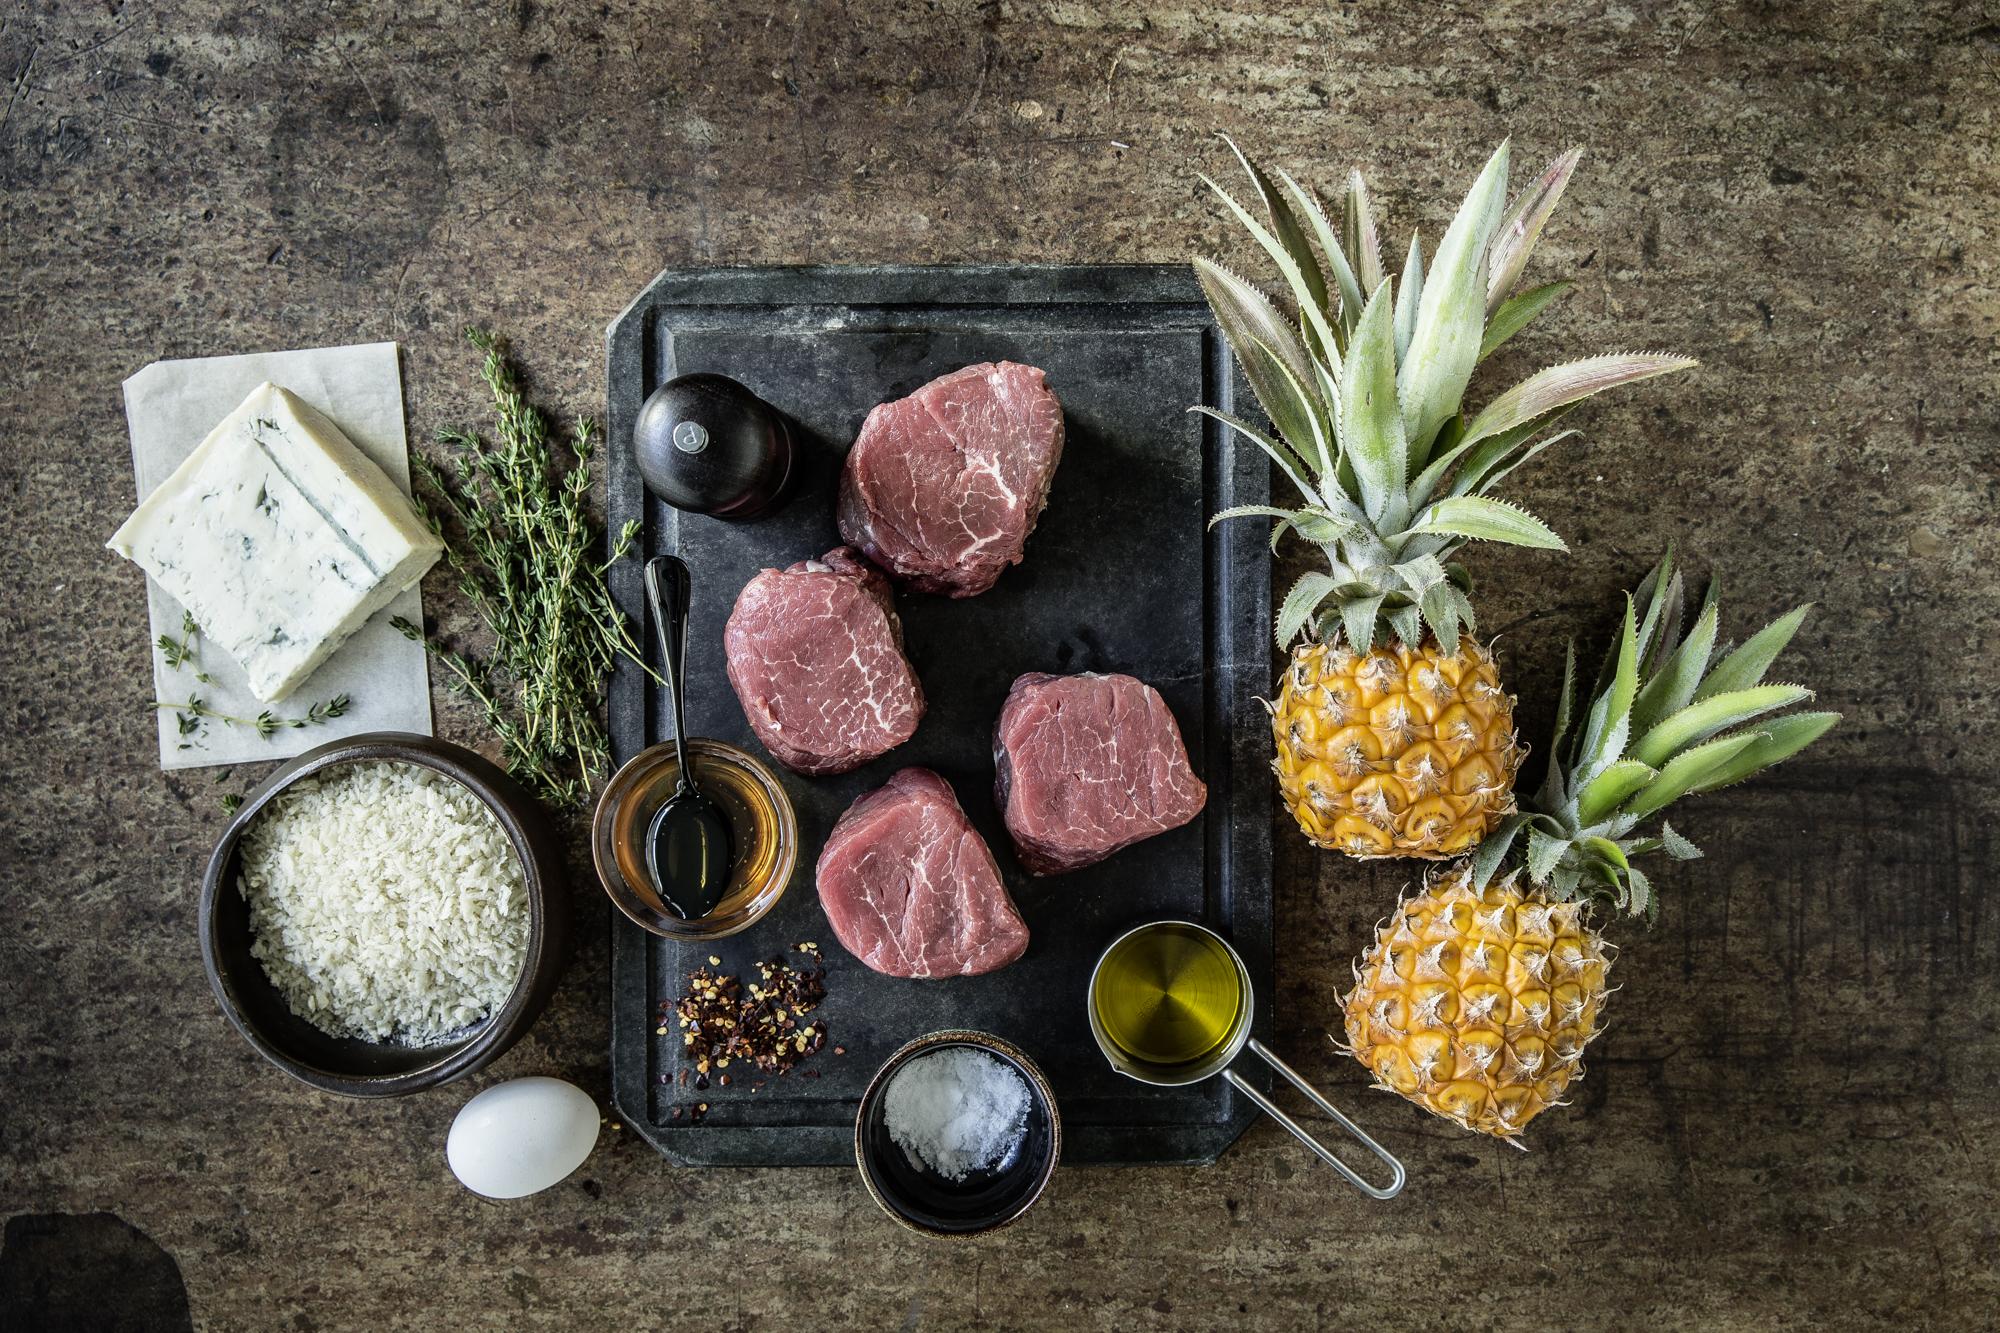 Food-Fotografie Meatlove, Stefan Schmidlin Fotograf Basel; Bild 24jpg